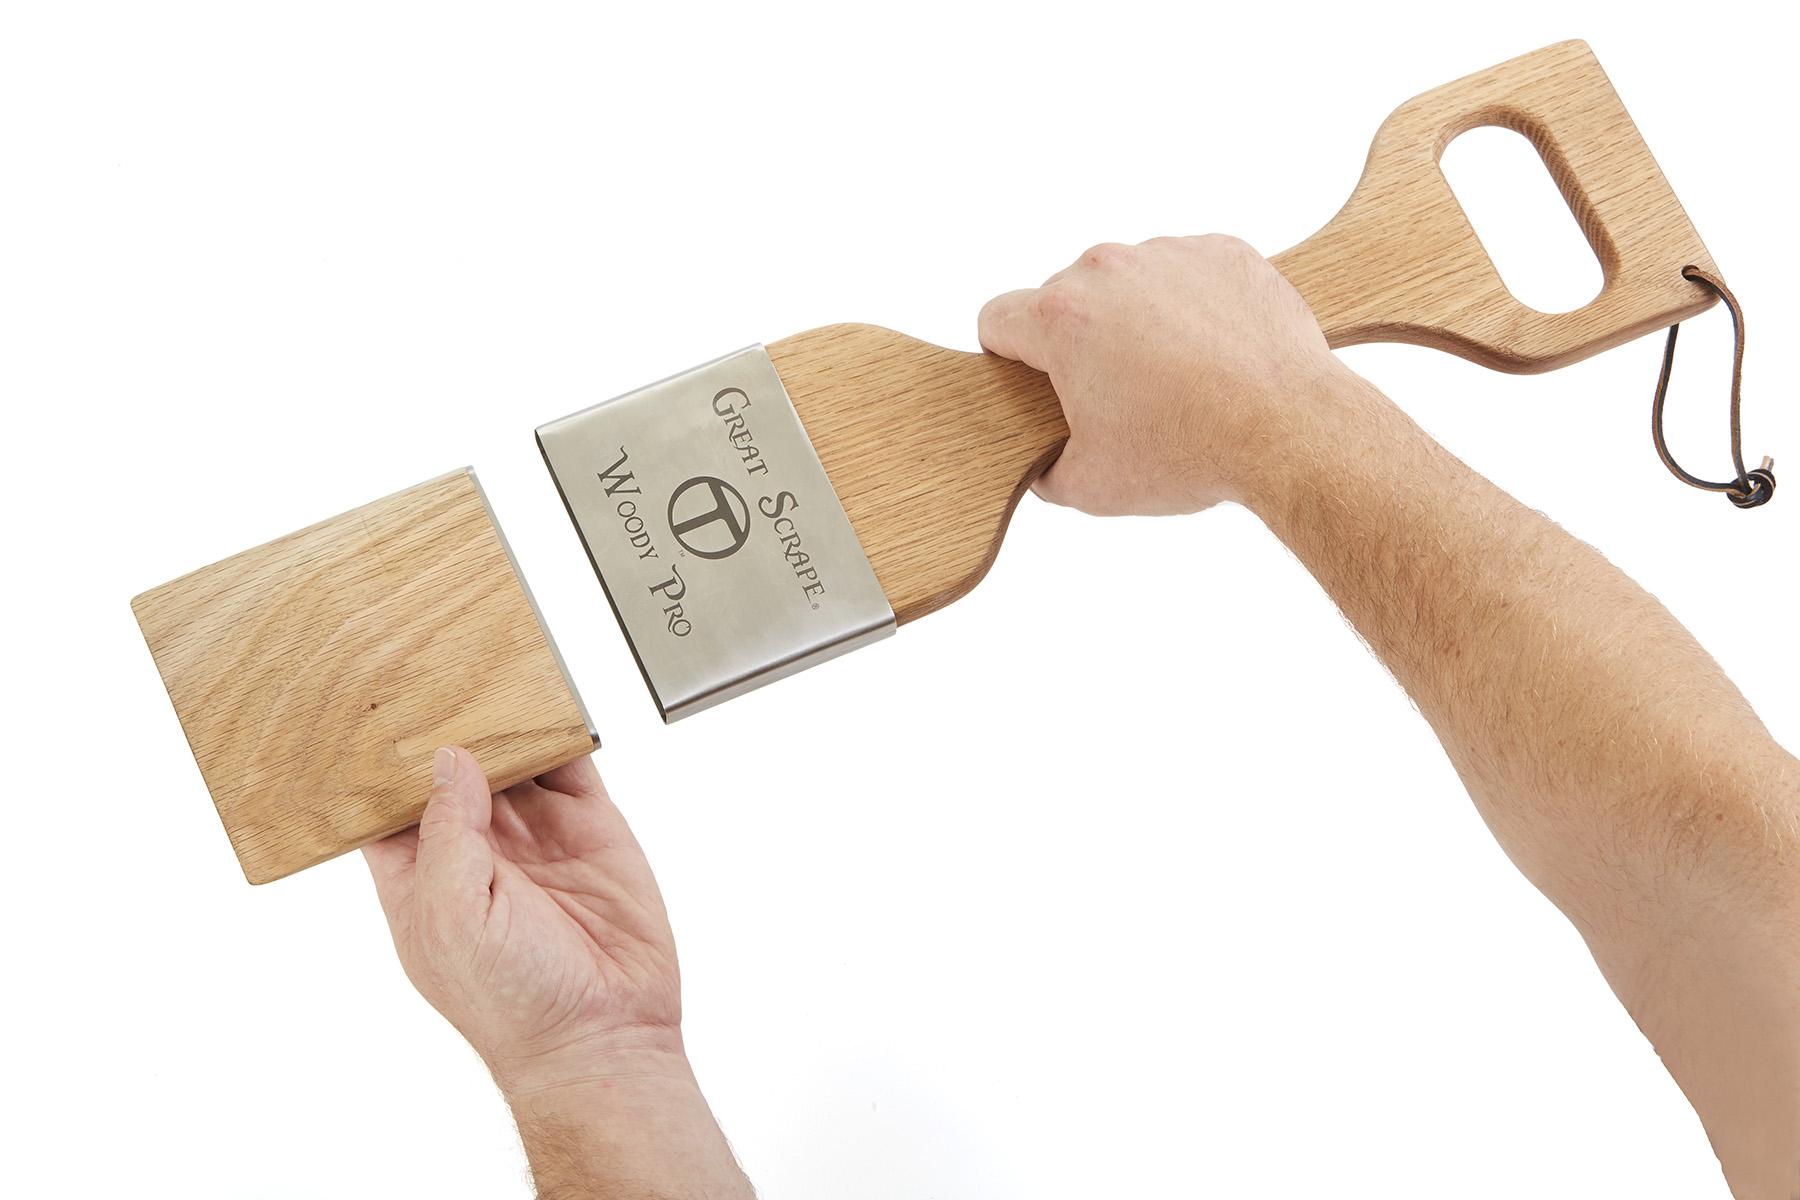 Pro tip removed hands-29843 RET 4x6